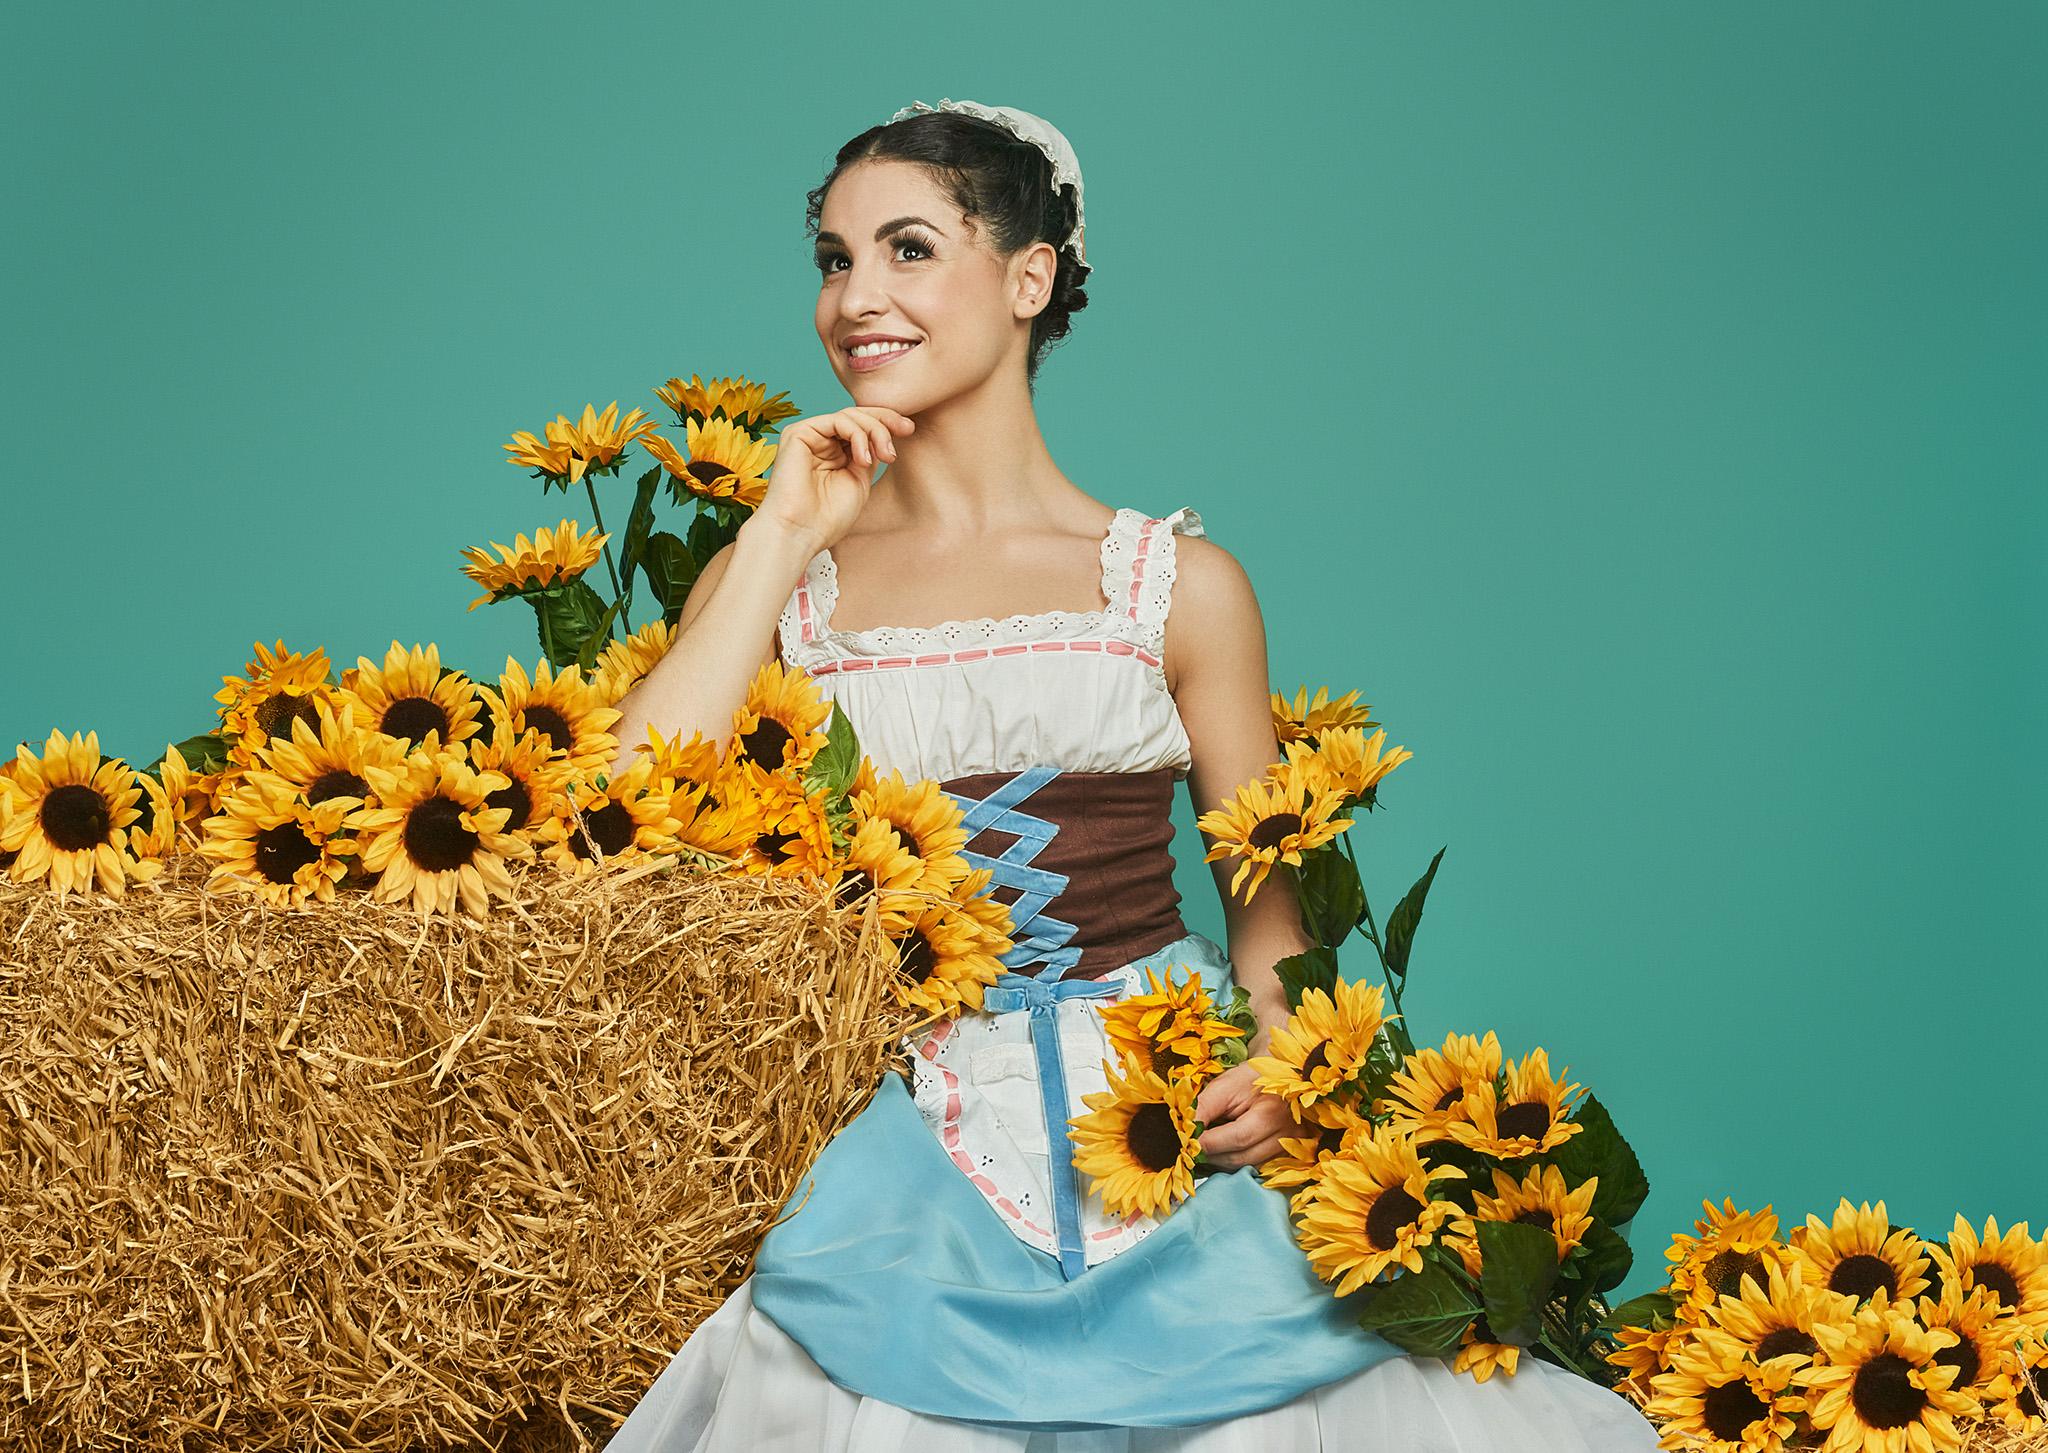 Bella_kotak_la_fille_mal_gadee_birmingham_royal_ballet_dancer_ballerina_hay_2.jpg